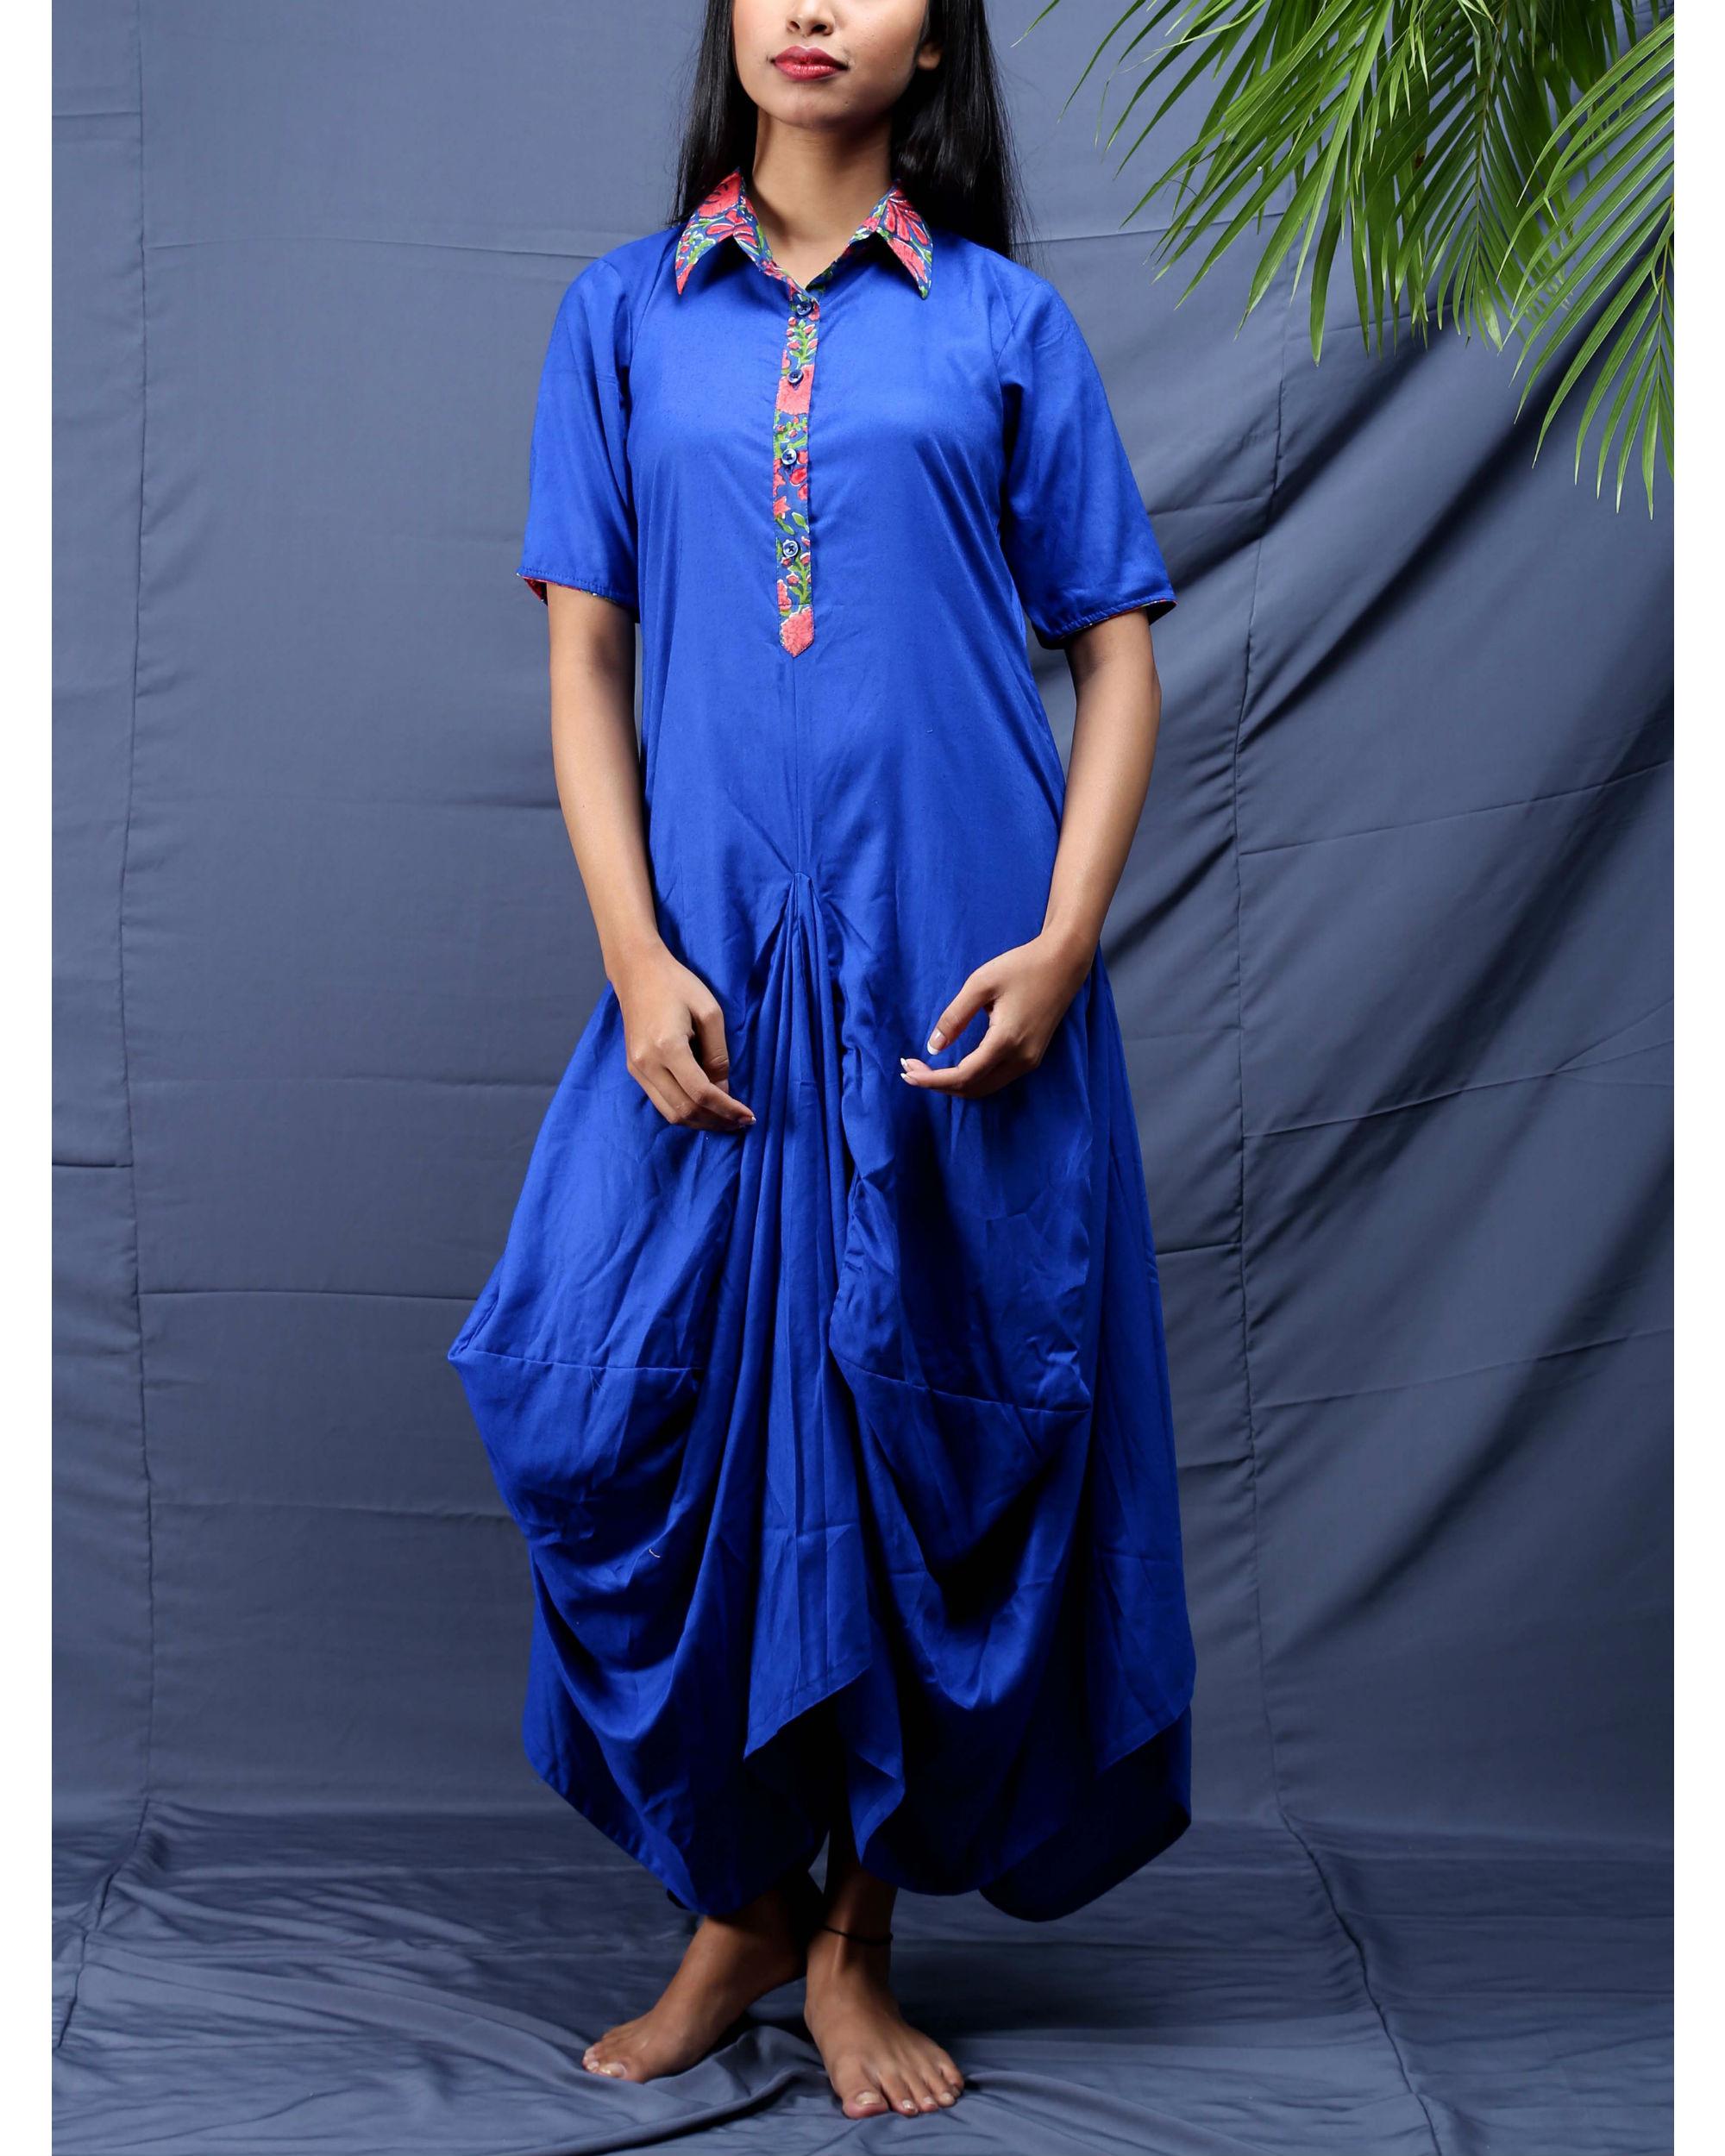 Blue jhabla dress